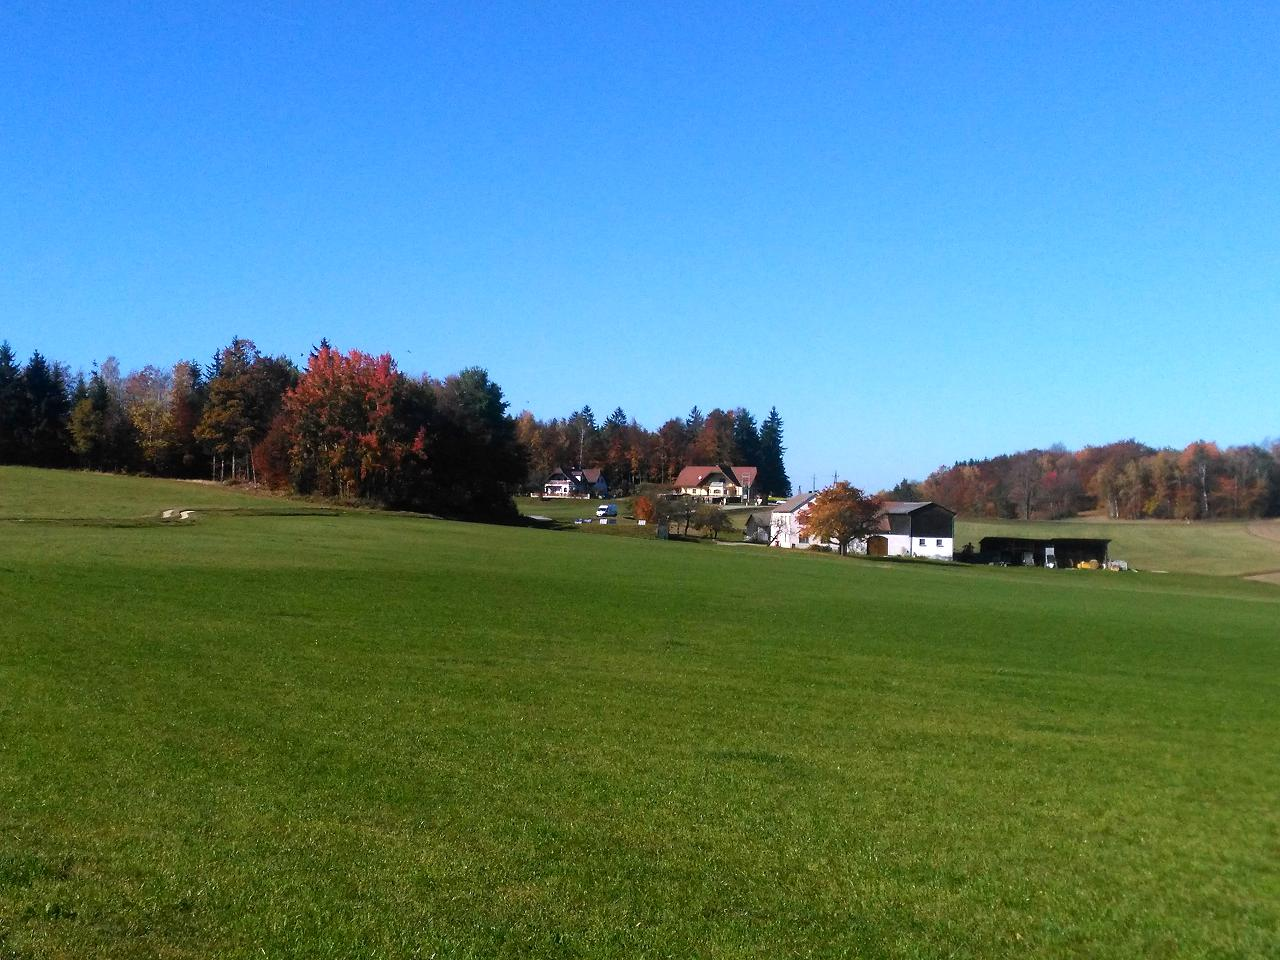 Rudi Jahn: Ober Neustift Herbst 2017